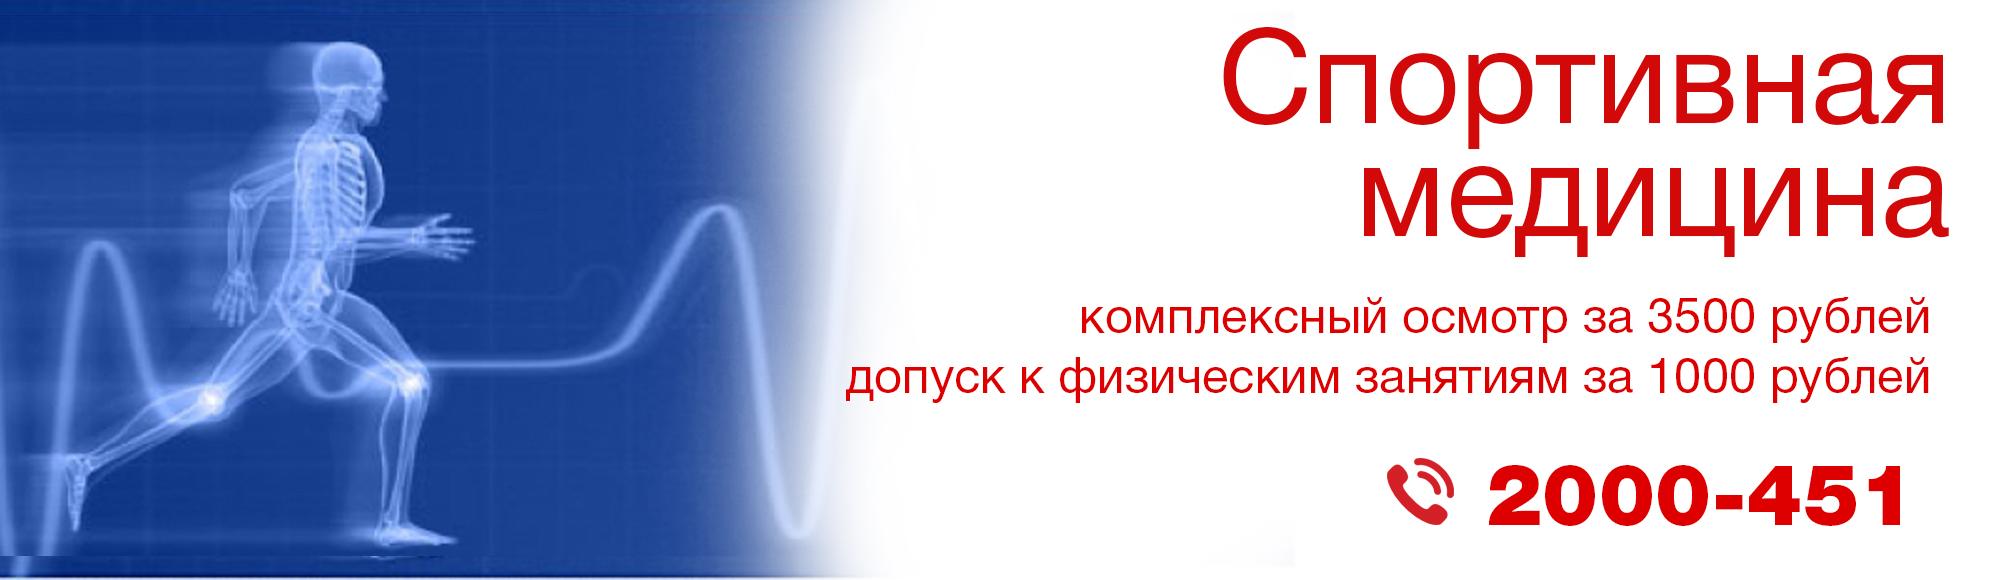 banner_sport_medicine